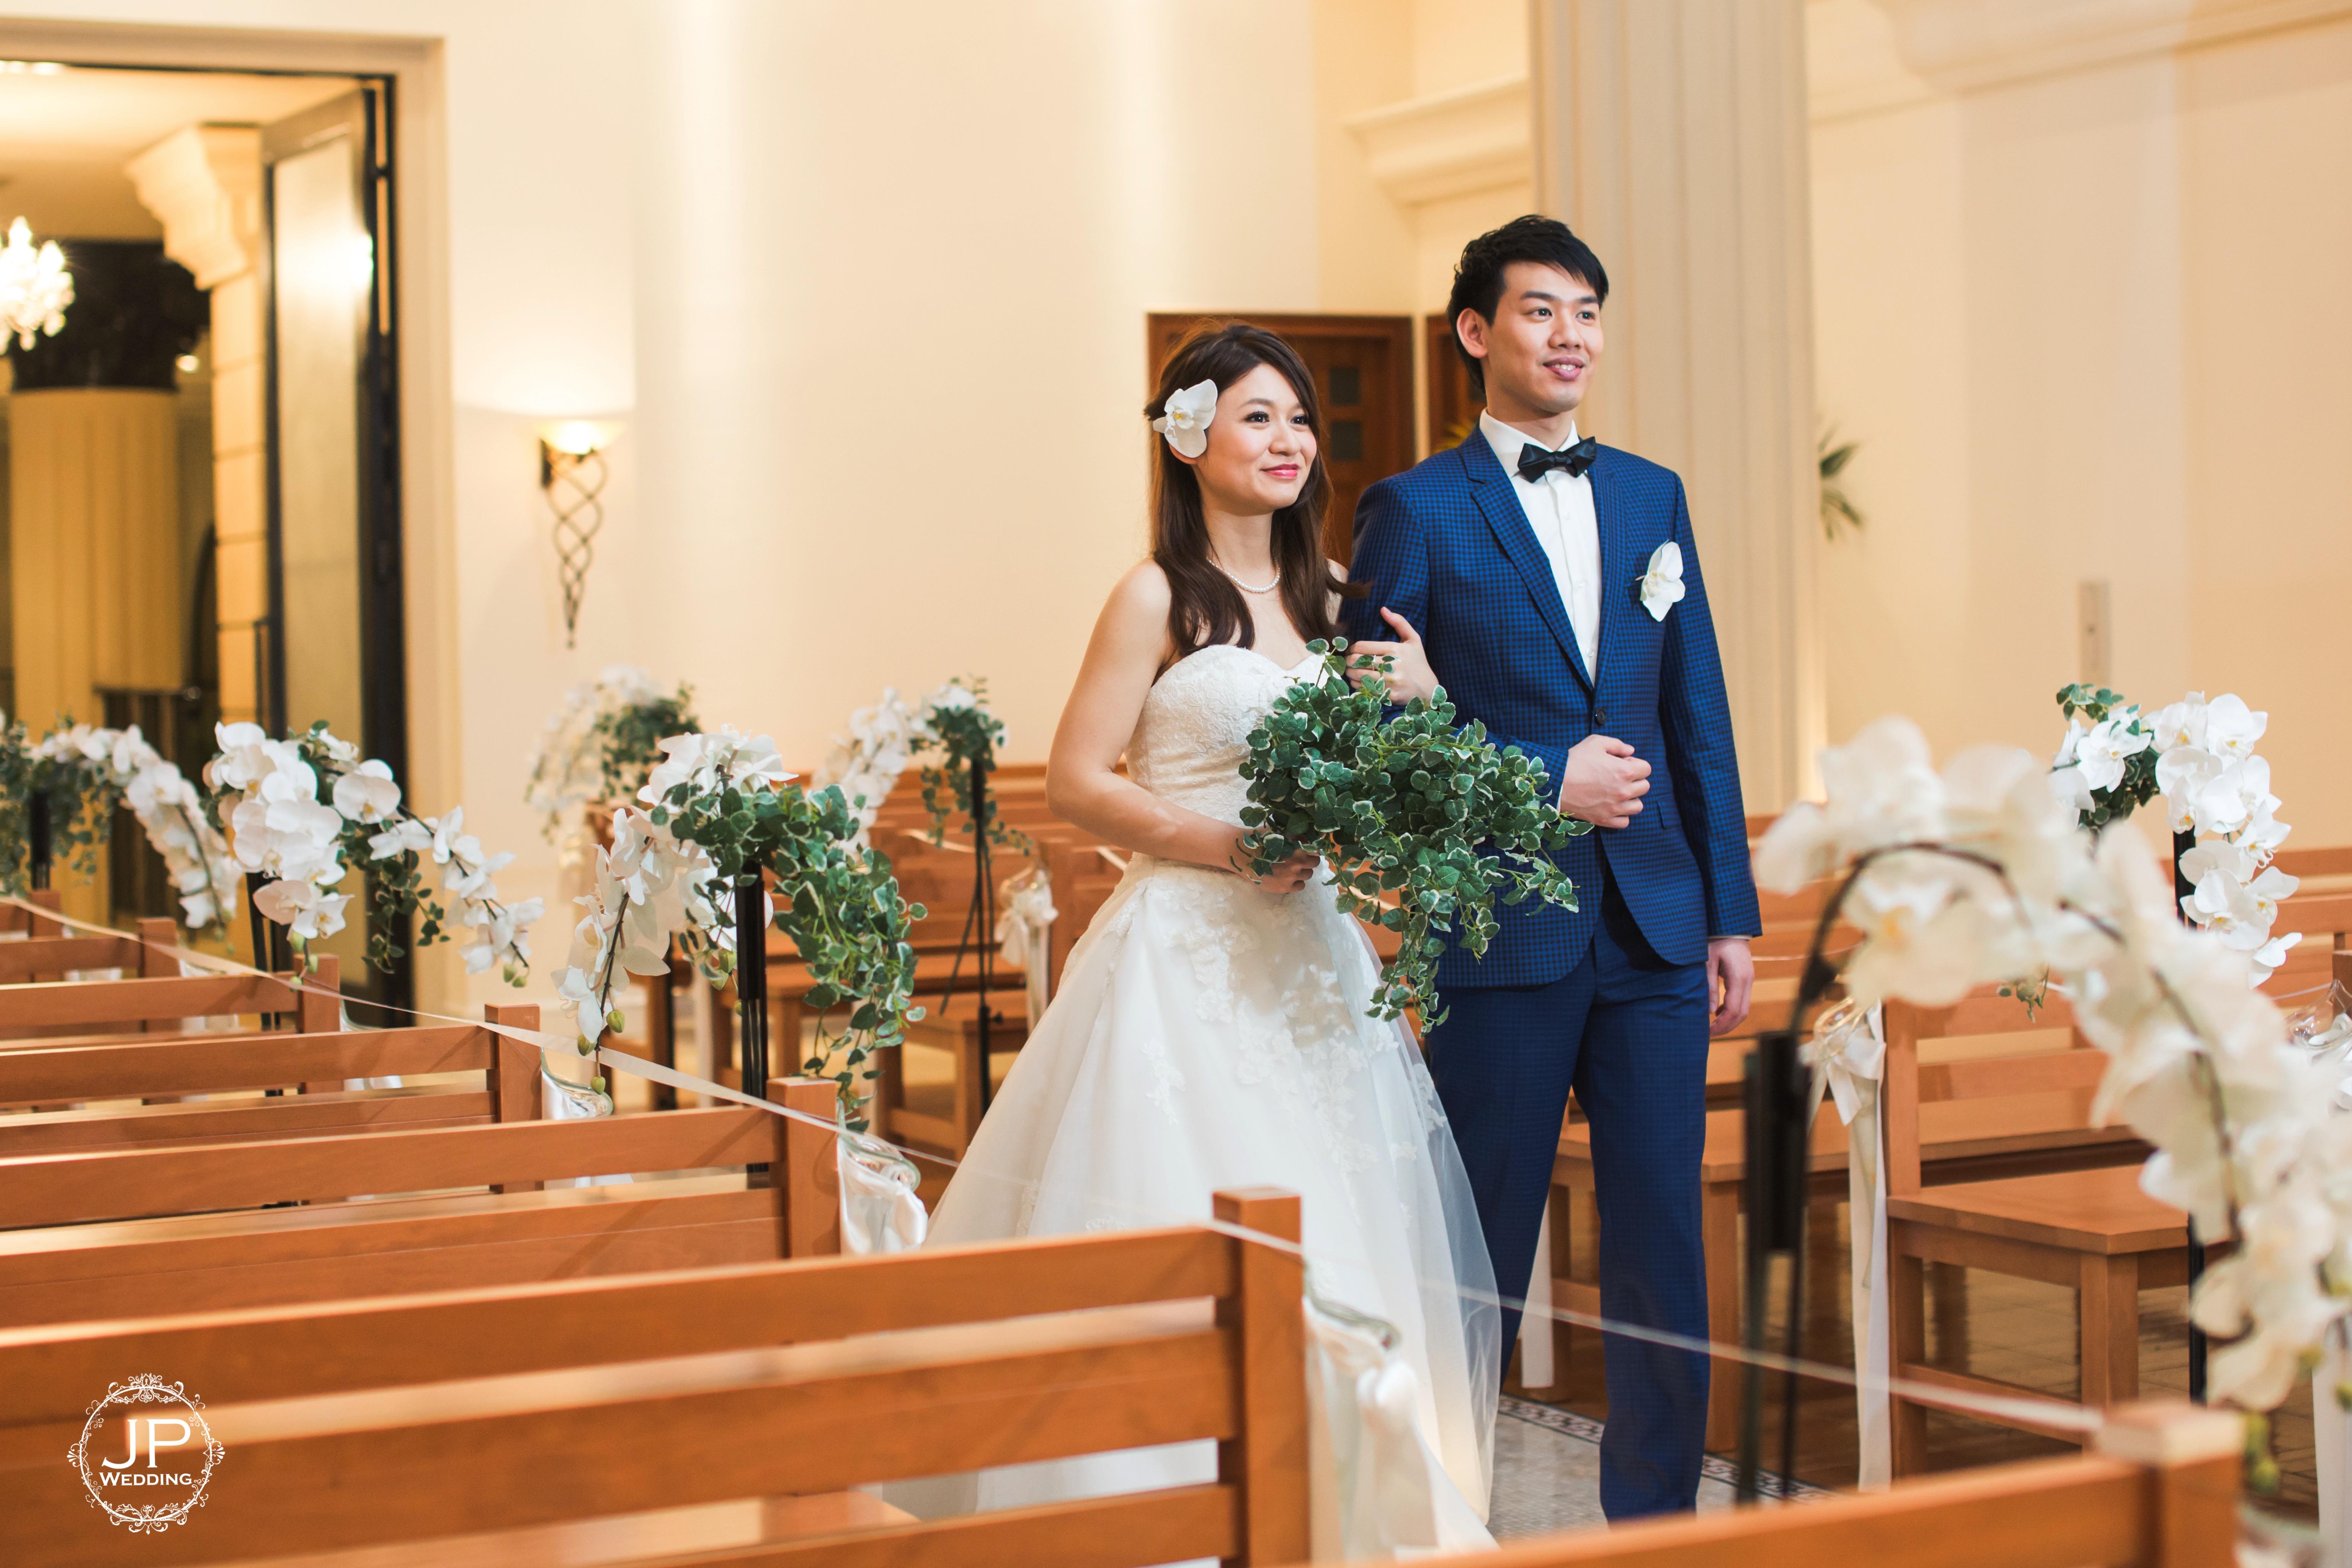 JP_Wedding-Hong_Kong_Prewedding_Photoshoot_Service-1